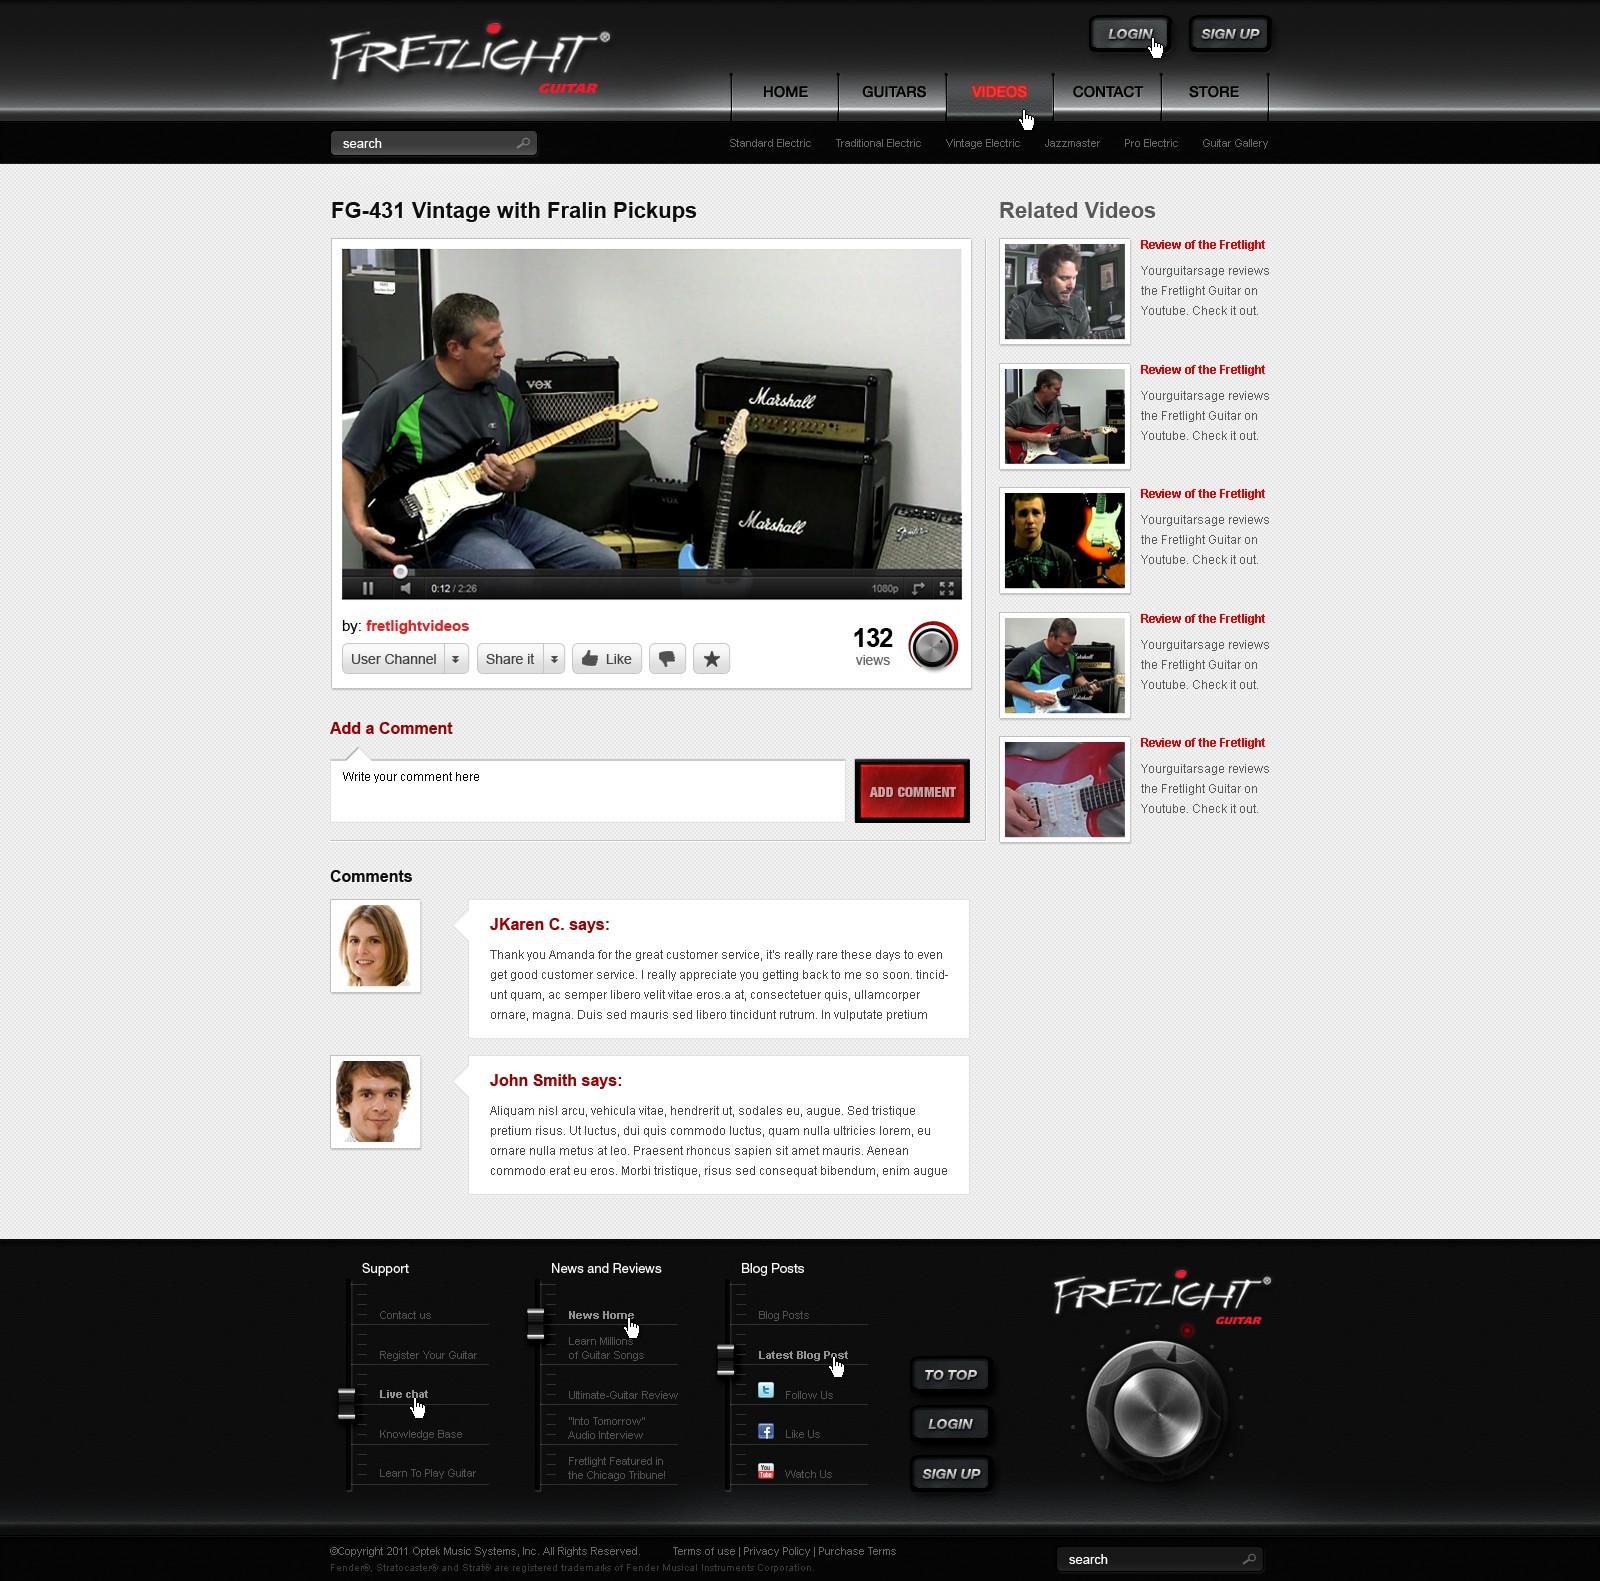 Fretlight Guitar needs a new website design